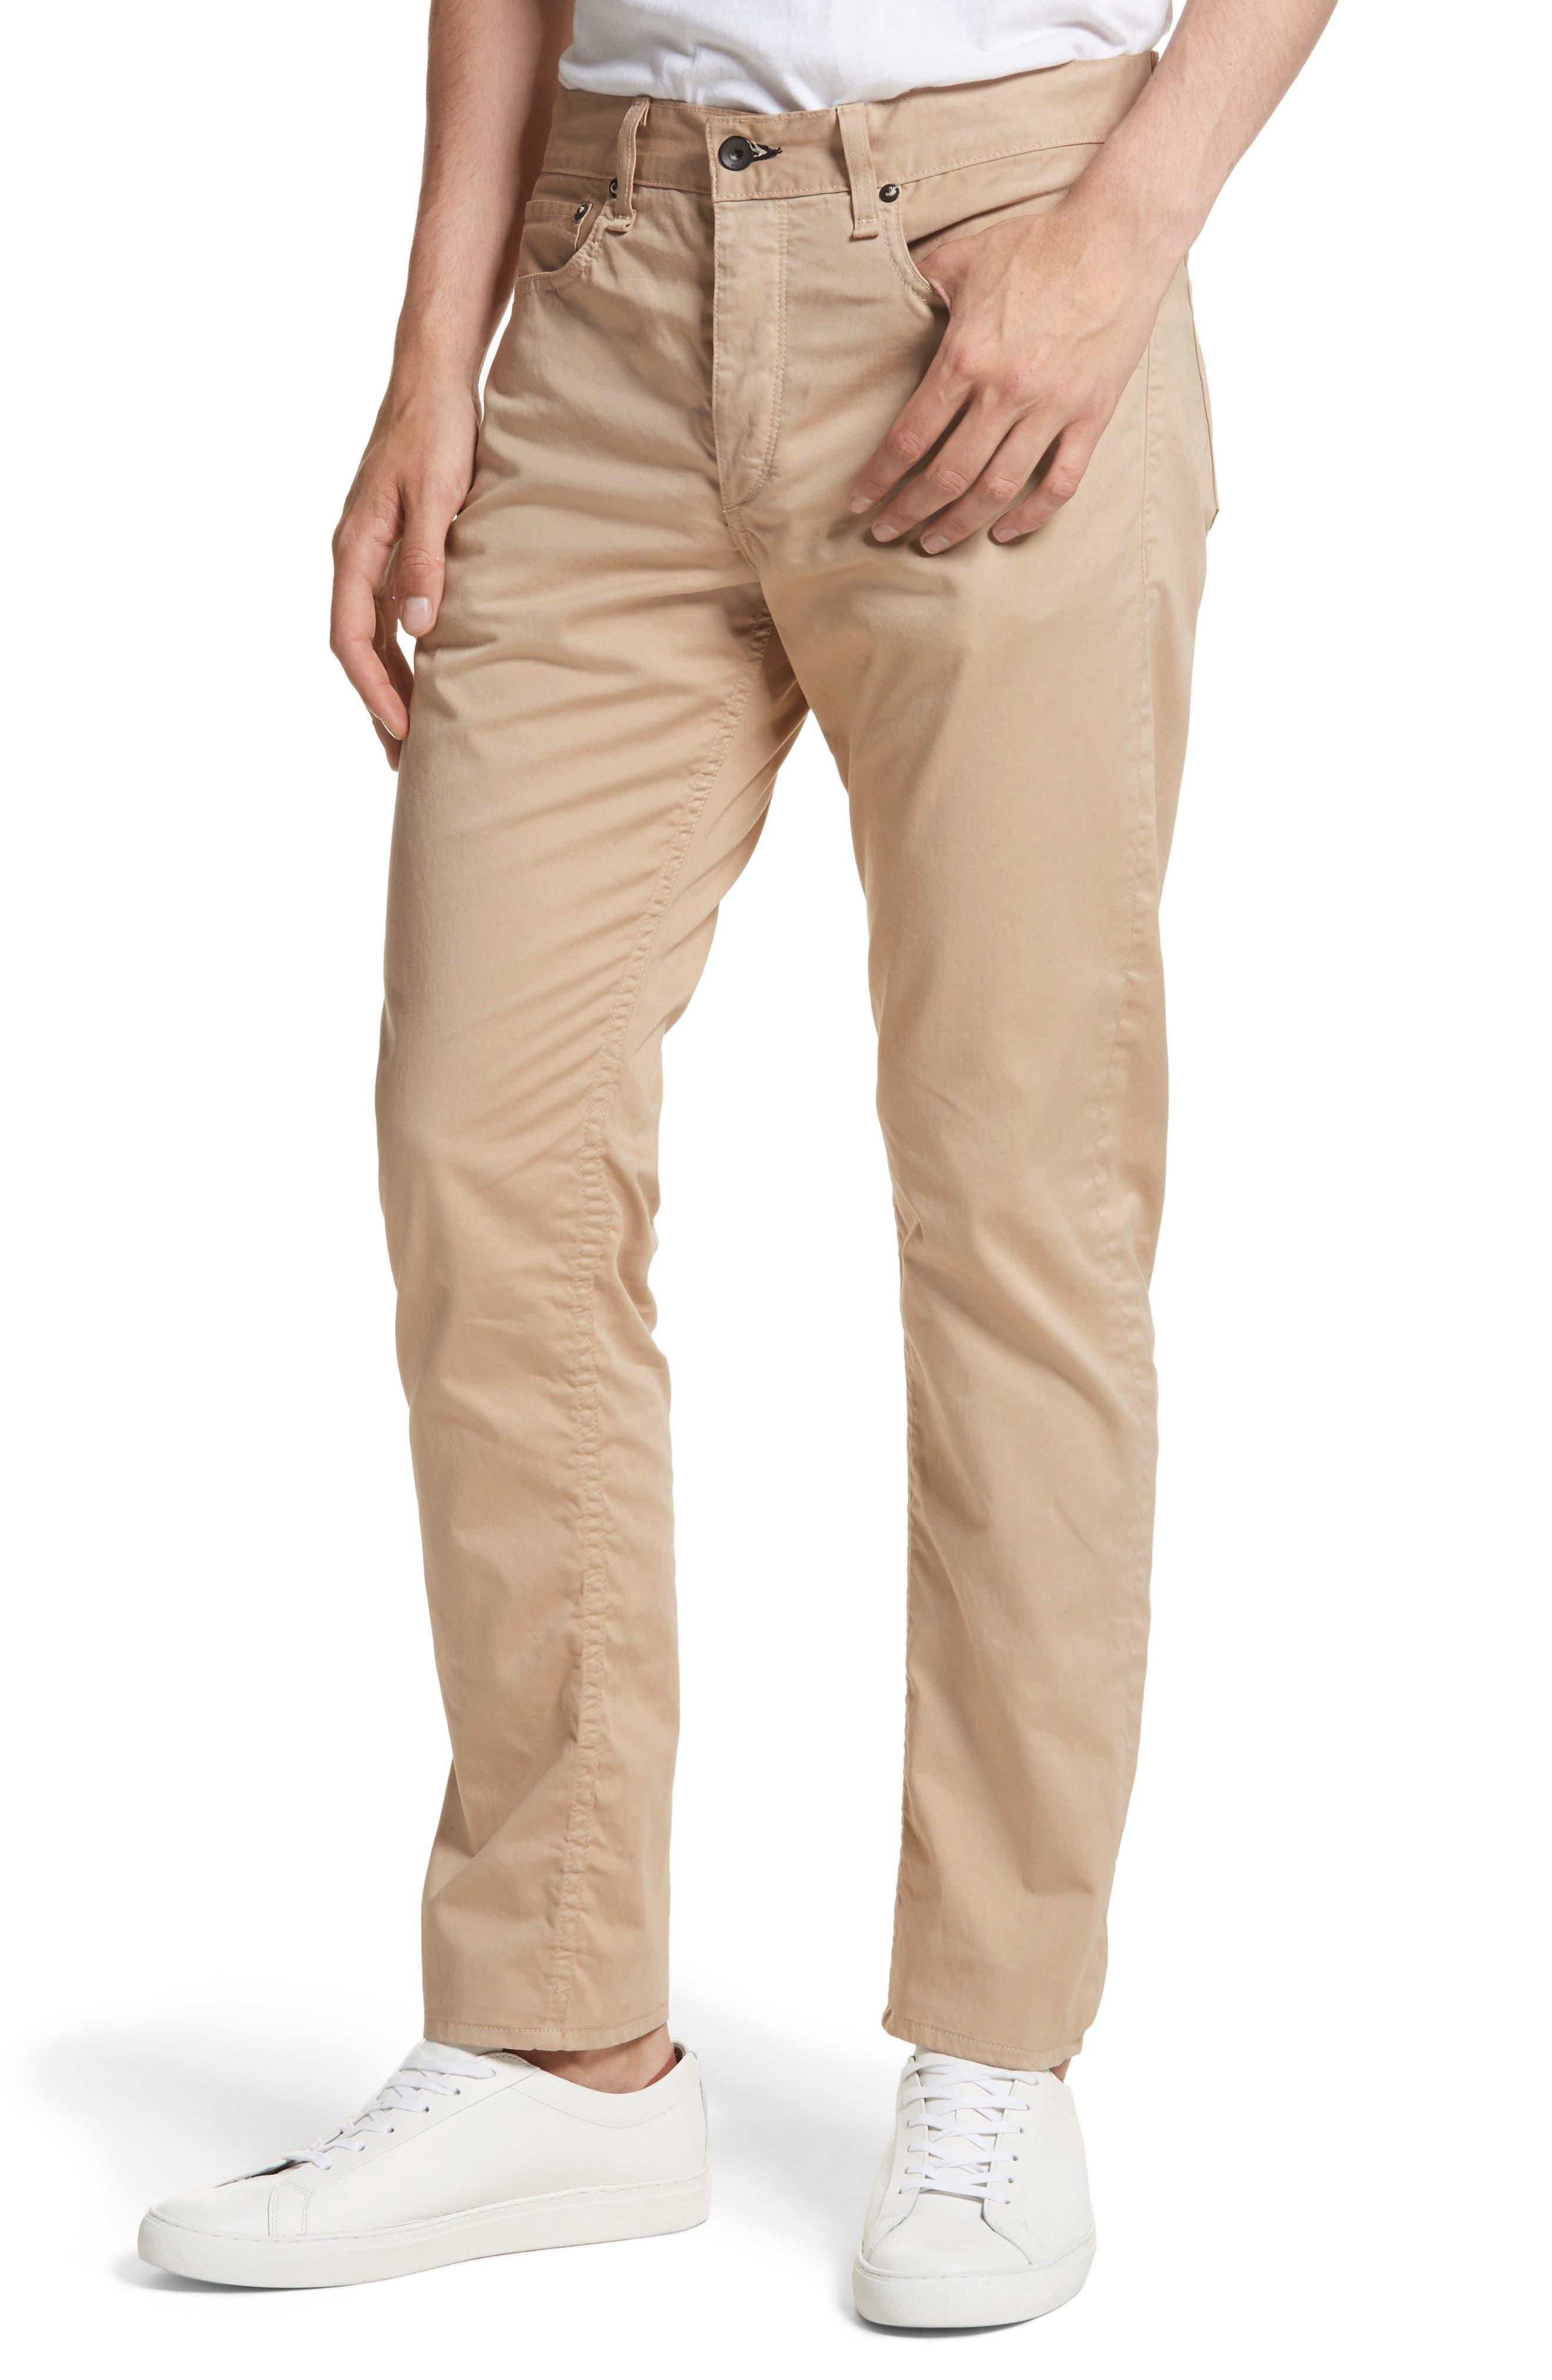 Fit 2 Five-Pocket Twill Pants,                             Alternate thumbnail 4, color,                             BEIGE